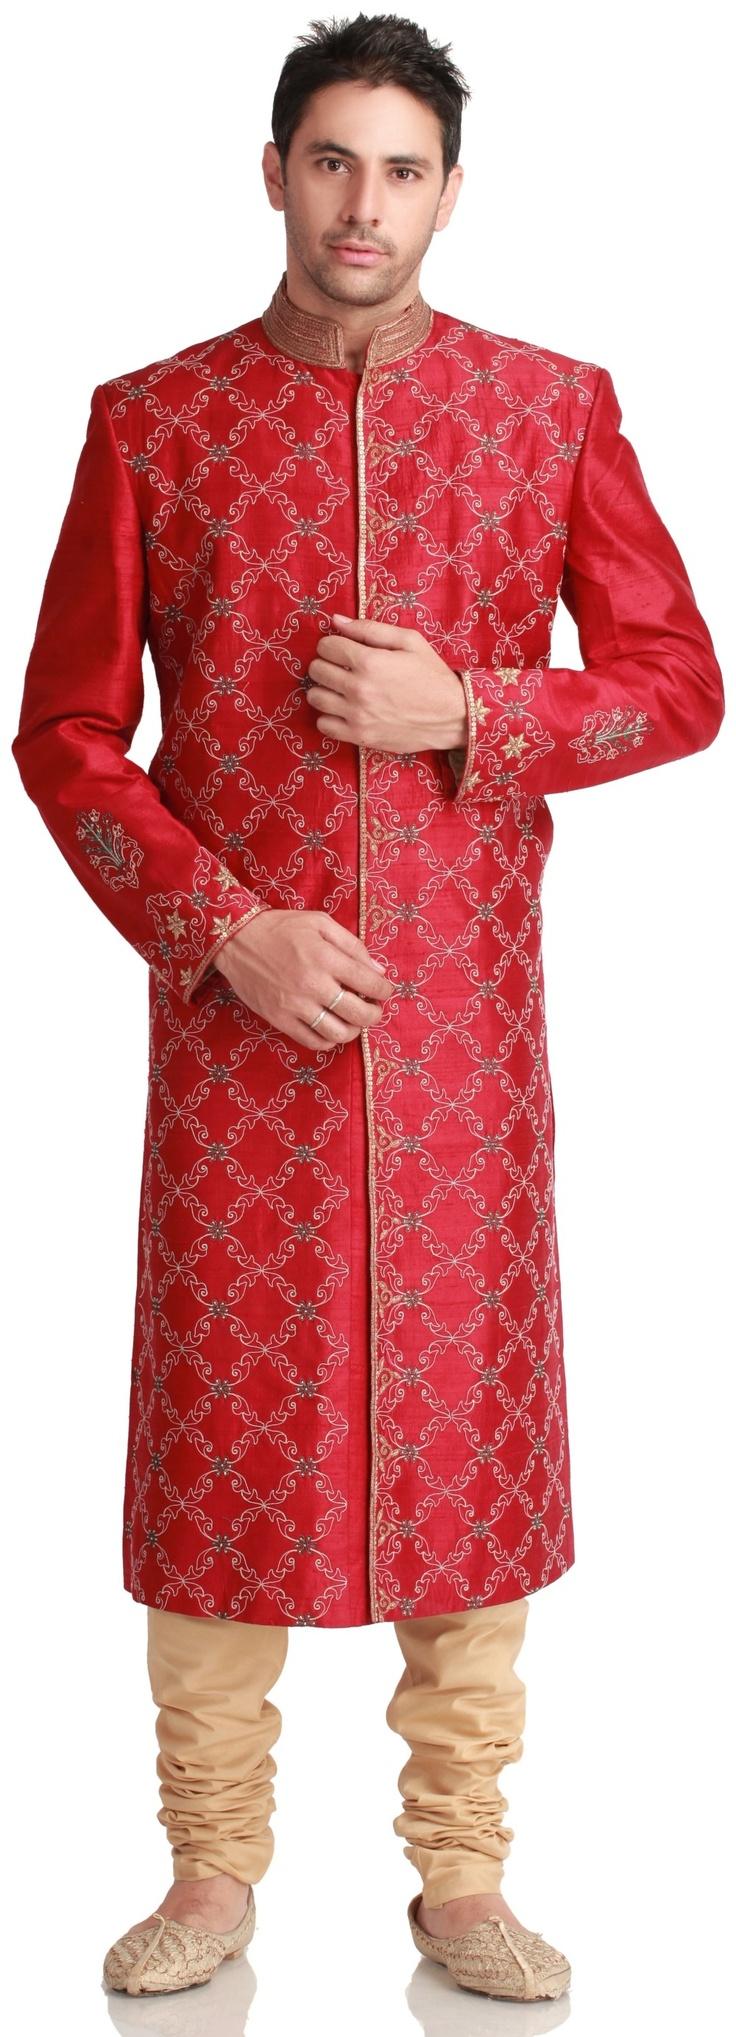 98 best indian groom wear images on pinterest wedding for Indian wedding dresses for man